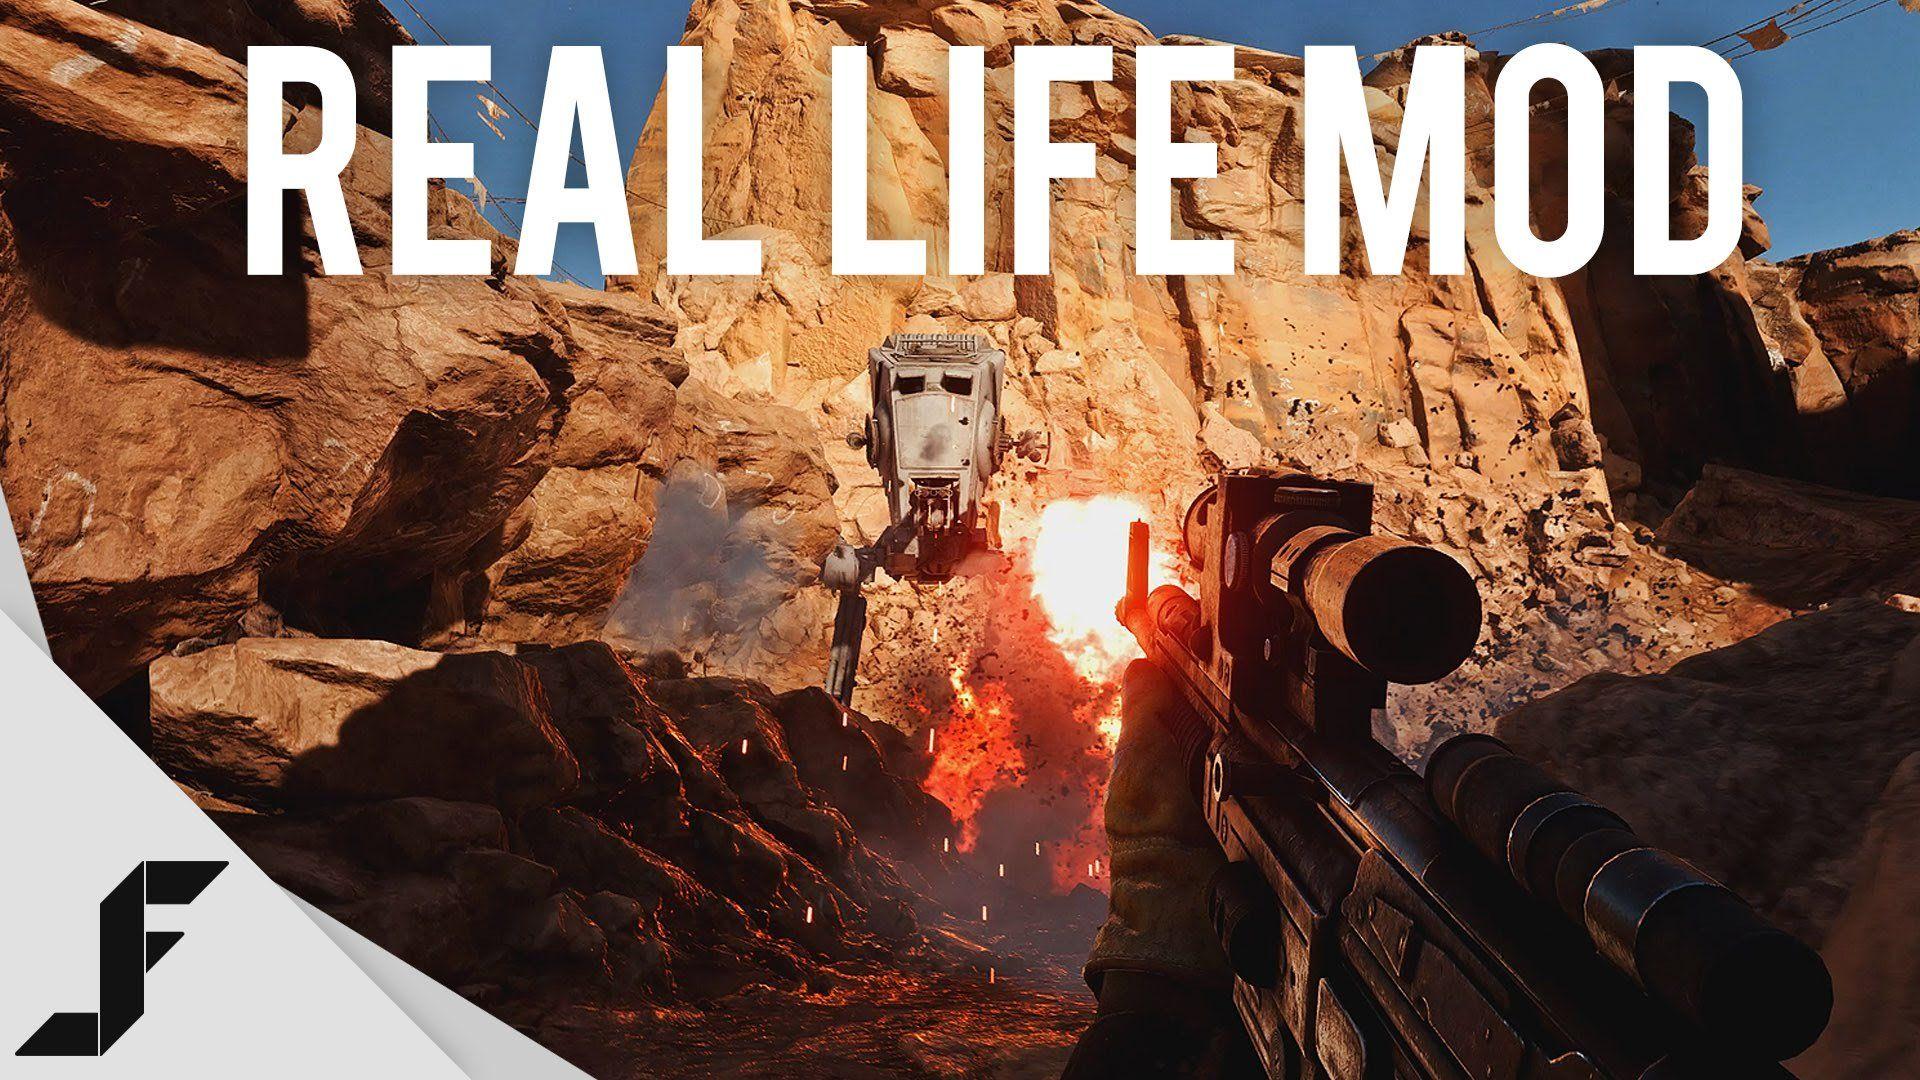 Star Wars Battlefront 'real life' mod at 4K 60FPS - TECKKNOW